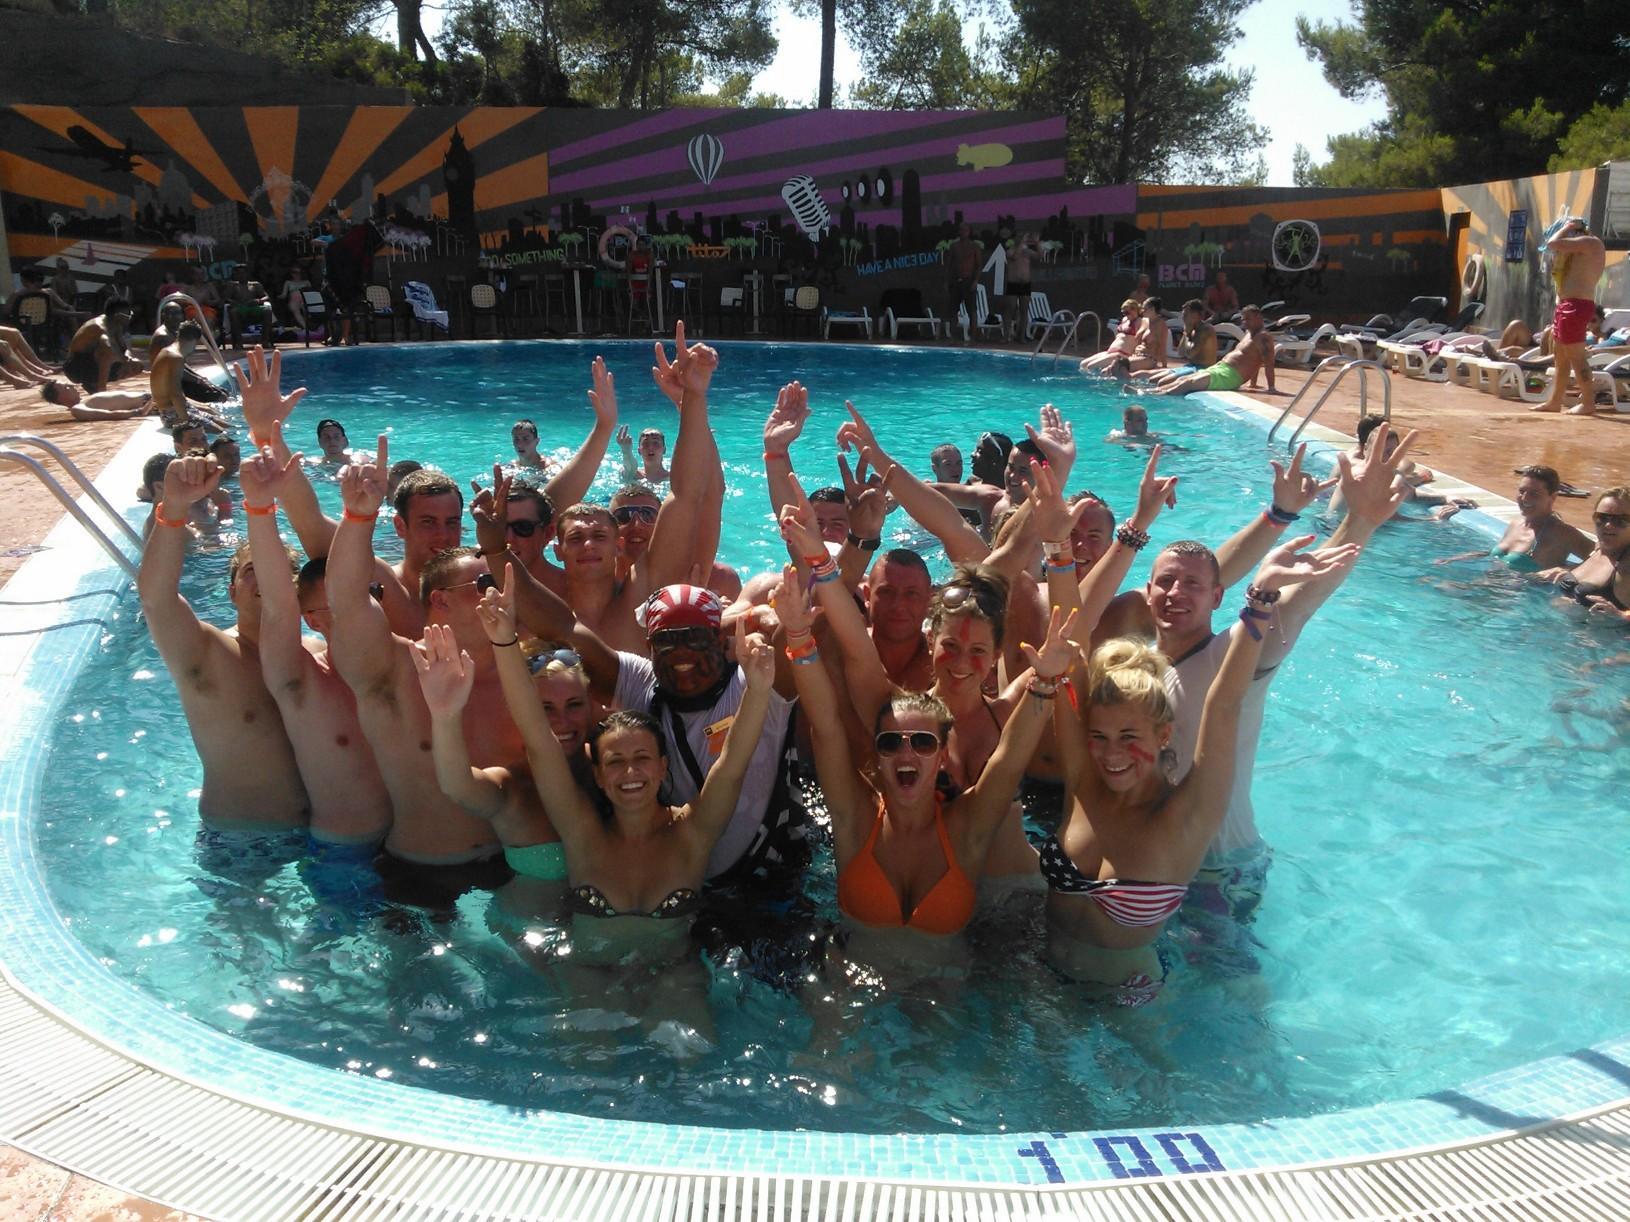 Hoteles j venes a thousand hotels - Fiesta de piscina ...